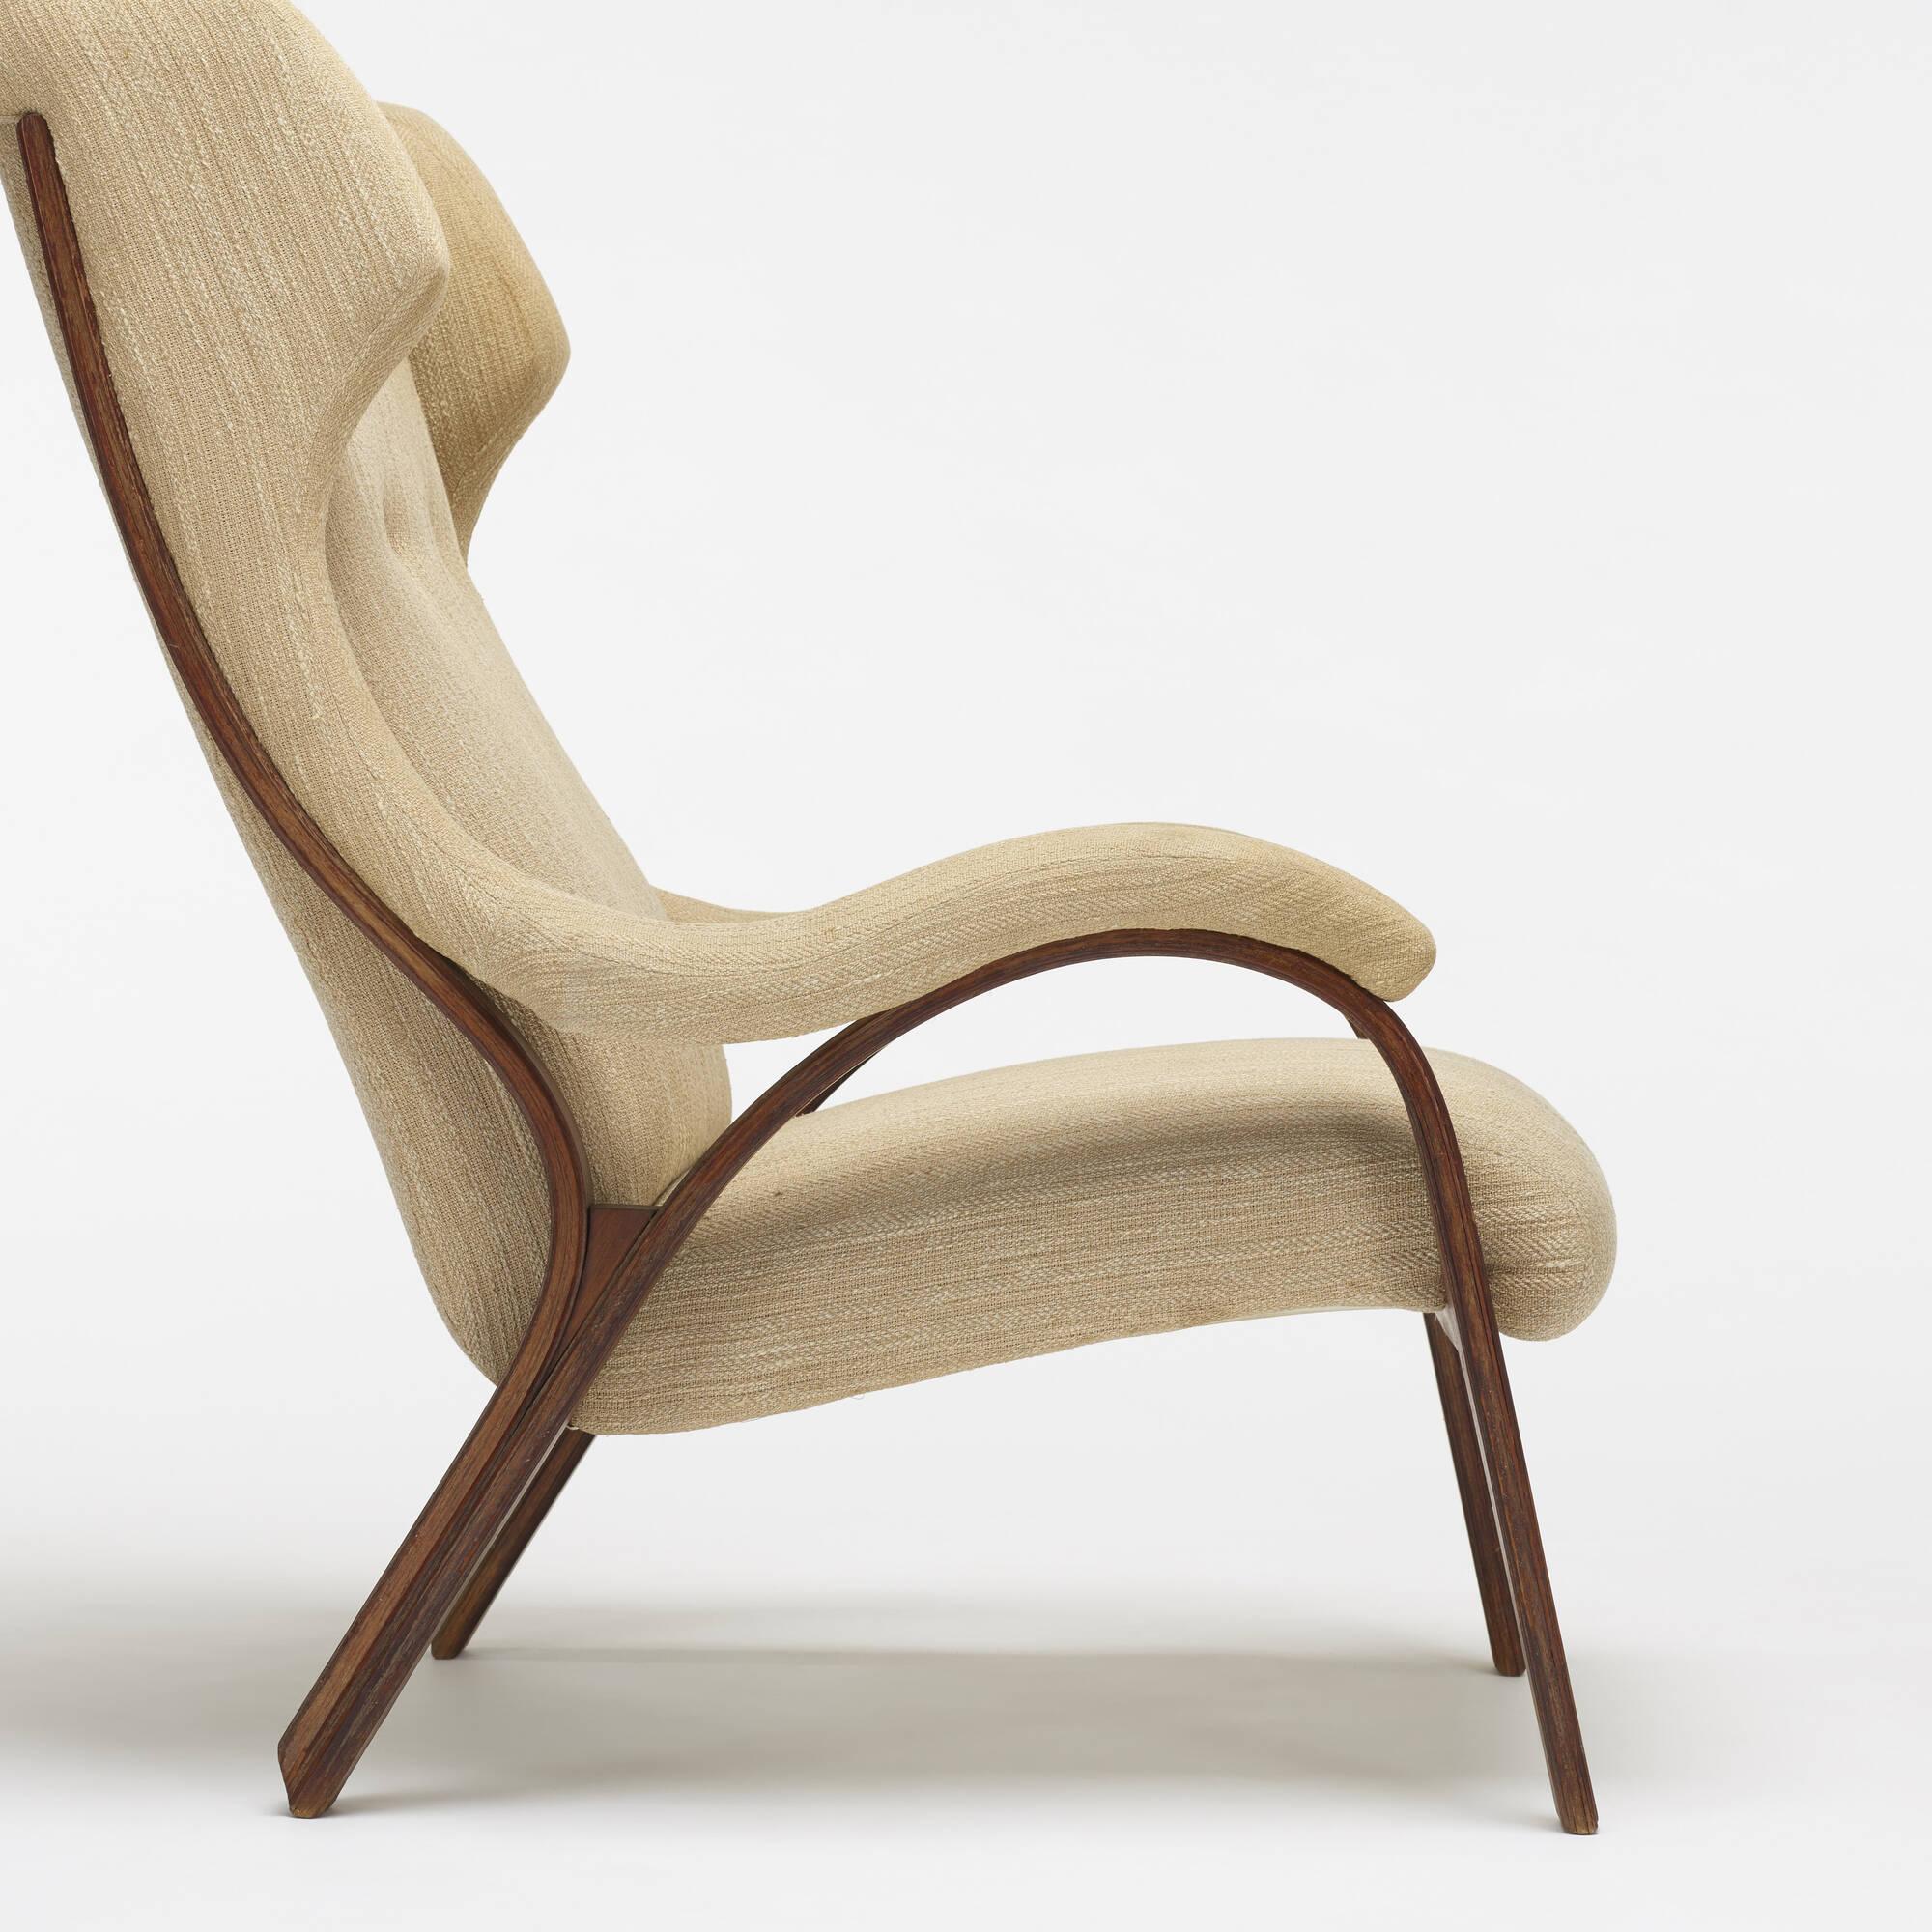 204: Vittorio Gregotti, Lodovico Meneghetti and Giotto Stoppino / prototype Cavour lounge chair and ottoman (3 of 3)